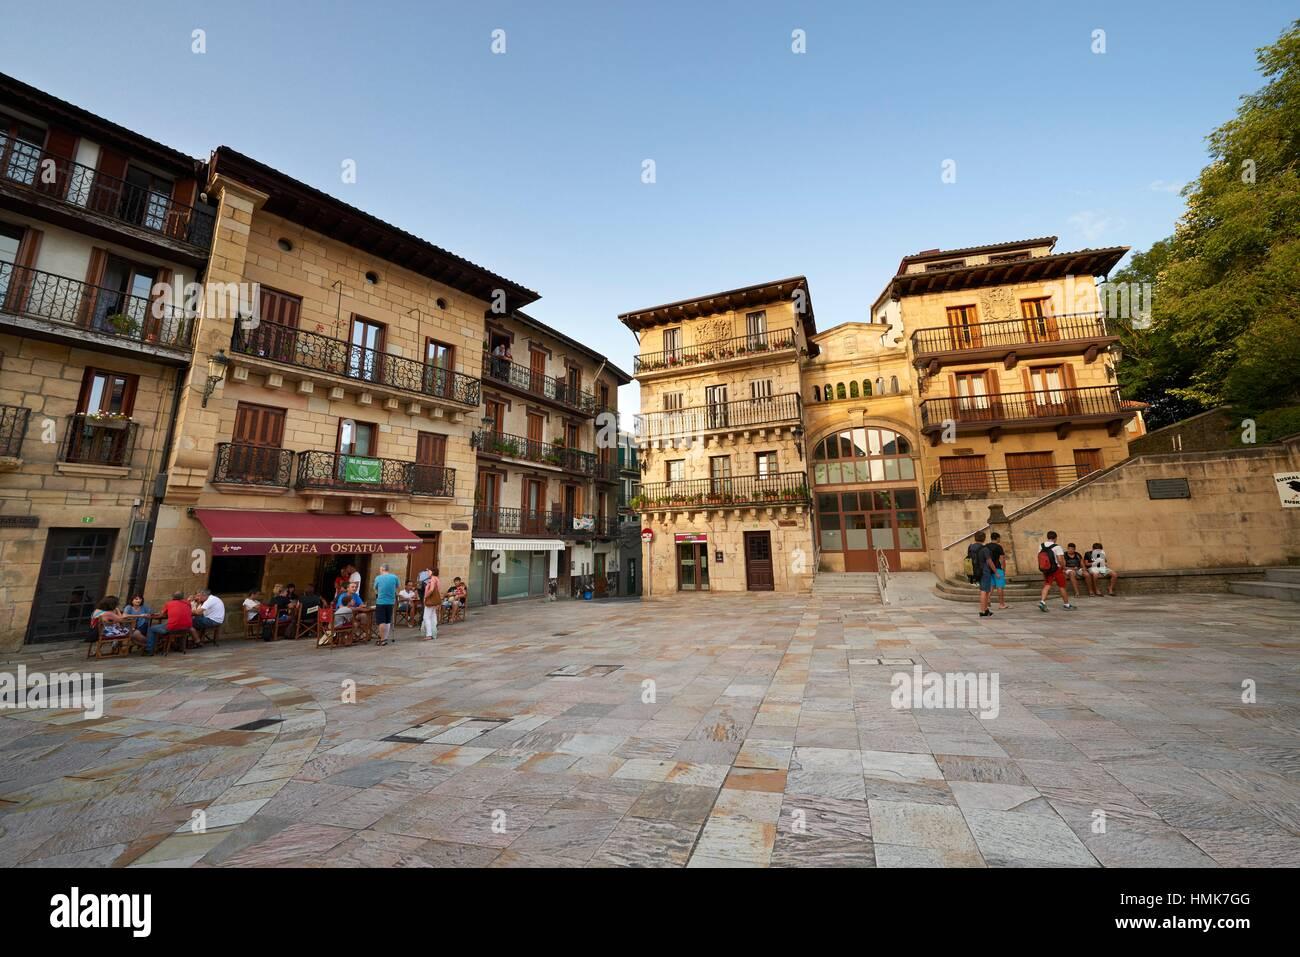 Lezo, Guipuzkoa, Basque Country, Euskadi, Euskal Herria, Spain, Europe. - Stock Image